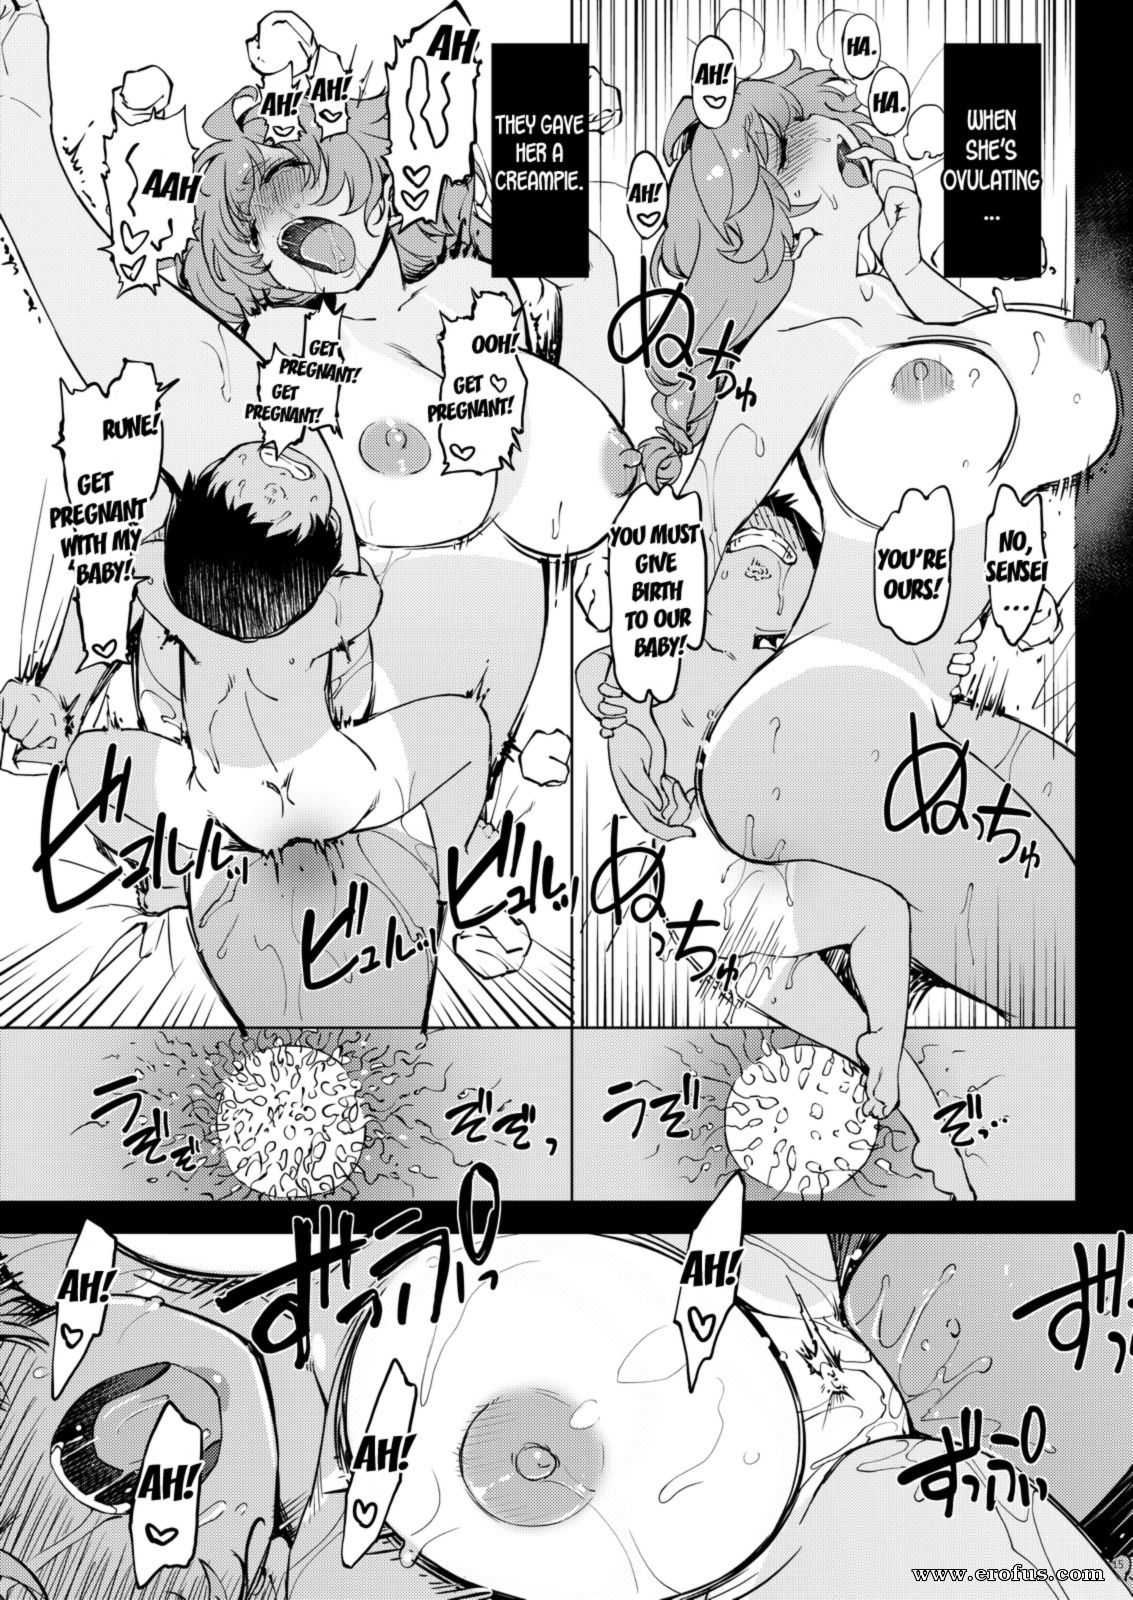 Get Pregnant Hentai page 14   hentai-and-manga-english/xration/motto-x2-onemuri